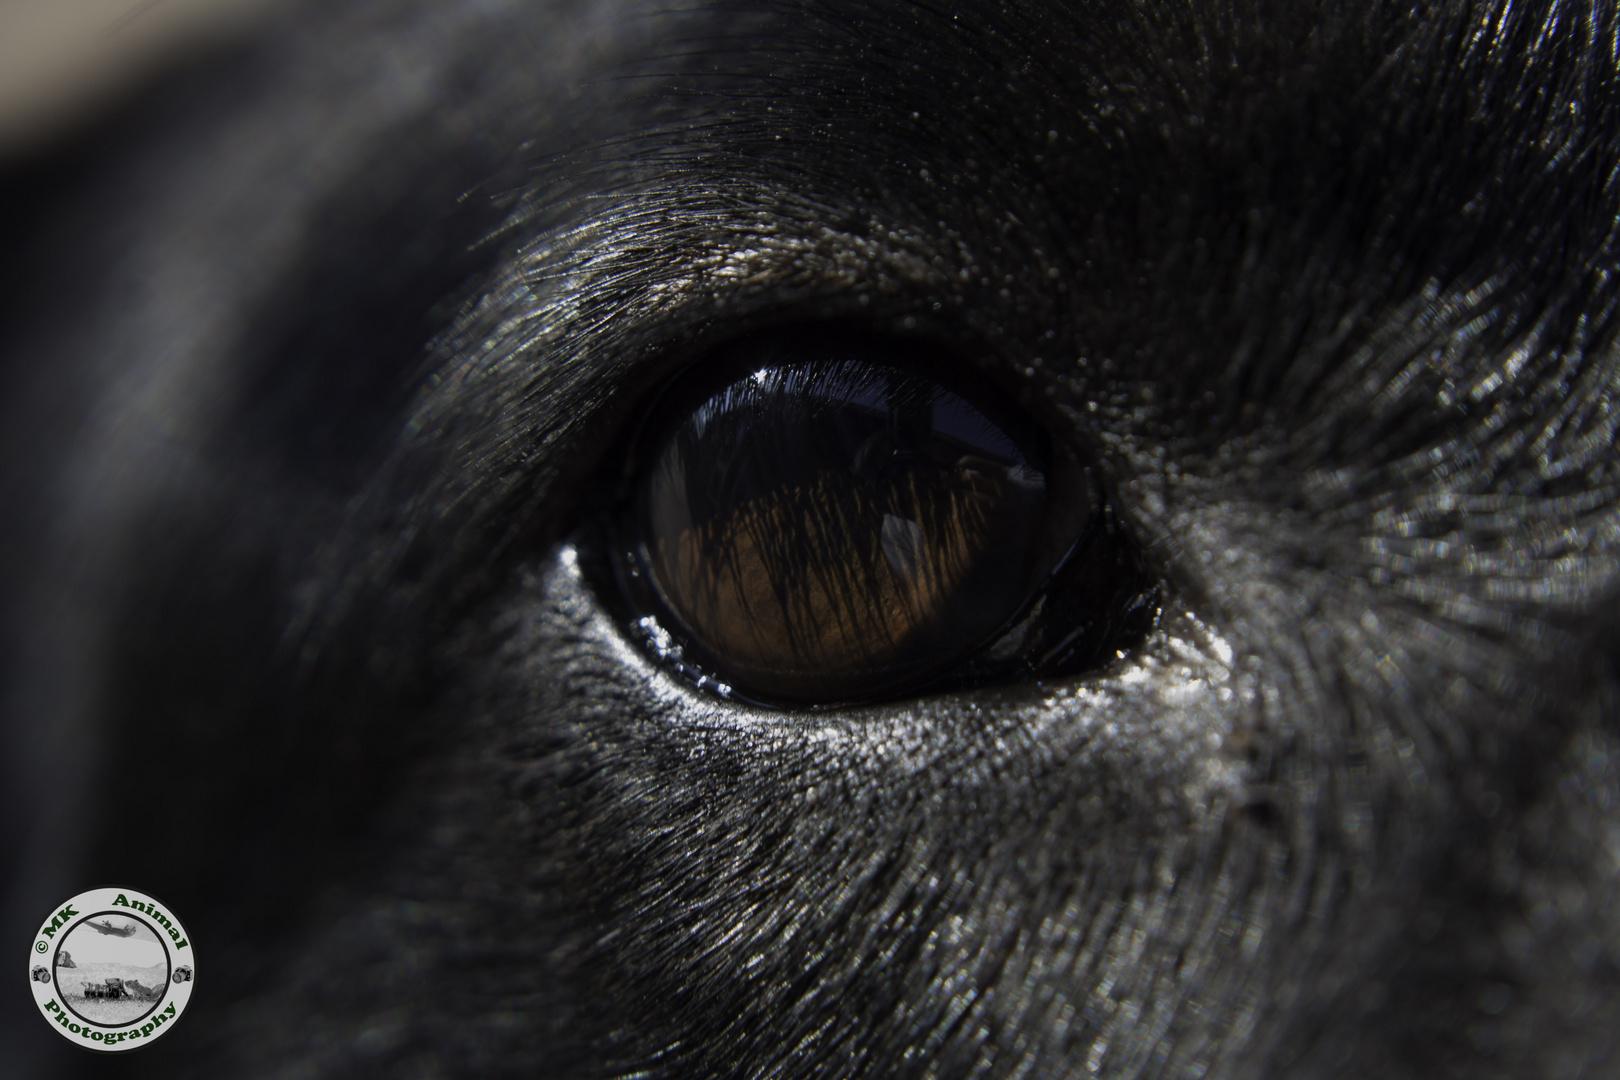 Hundeauge /Dogseye